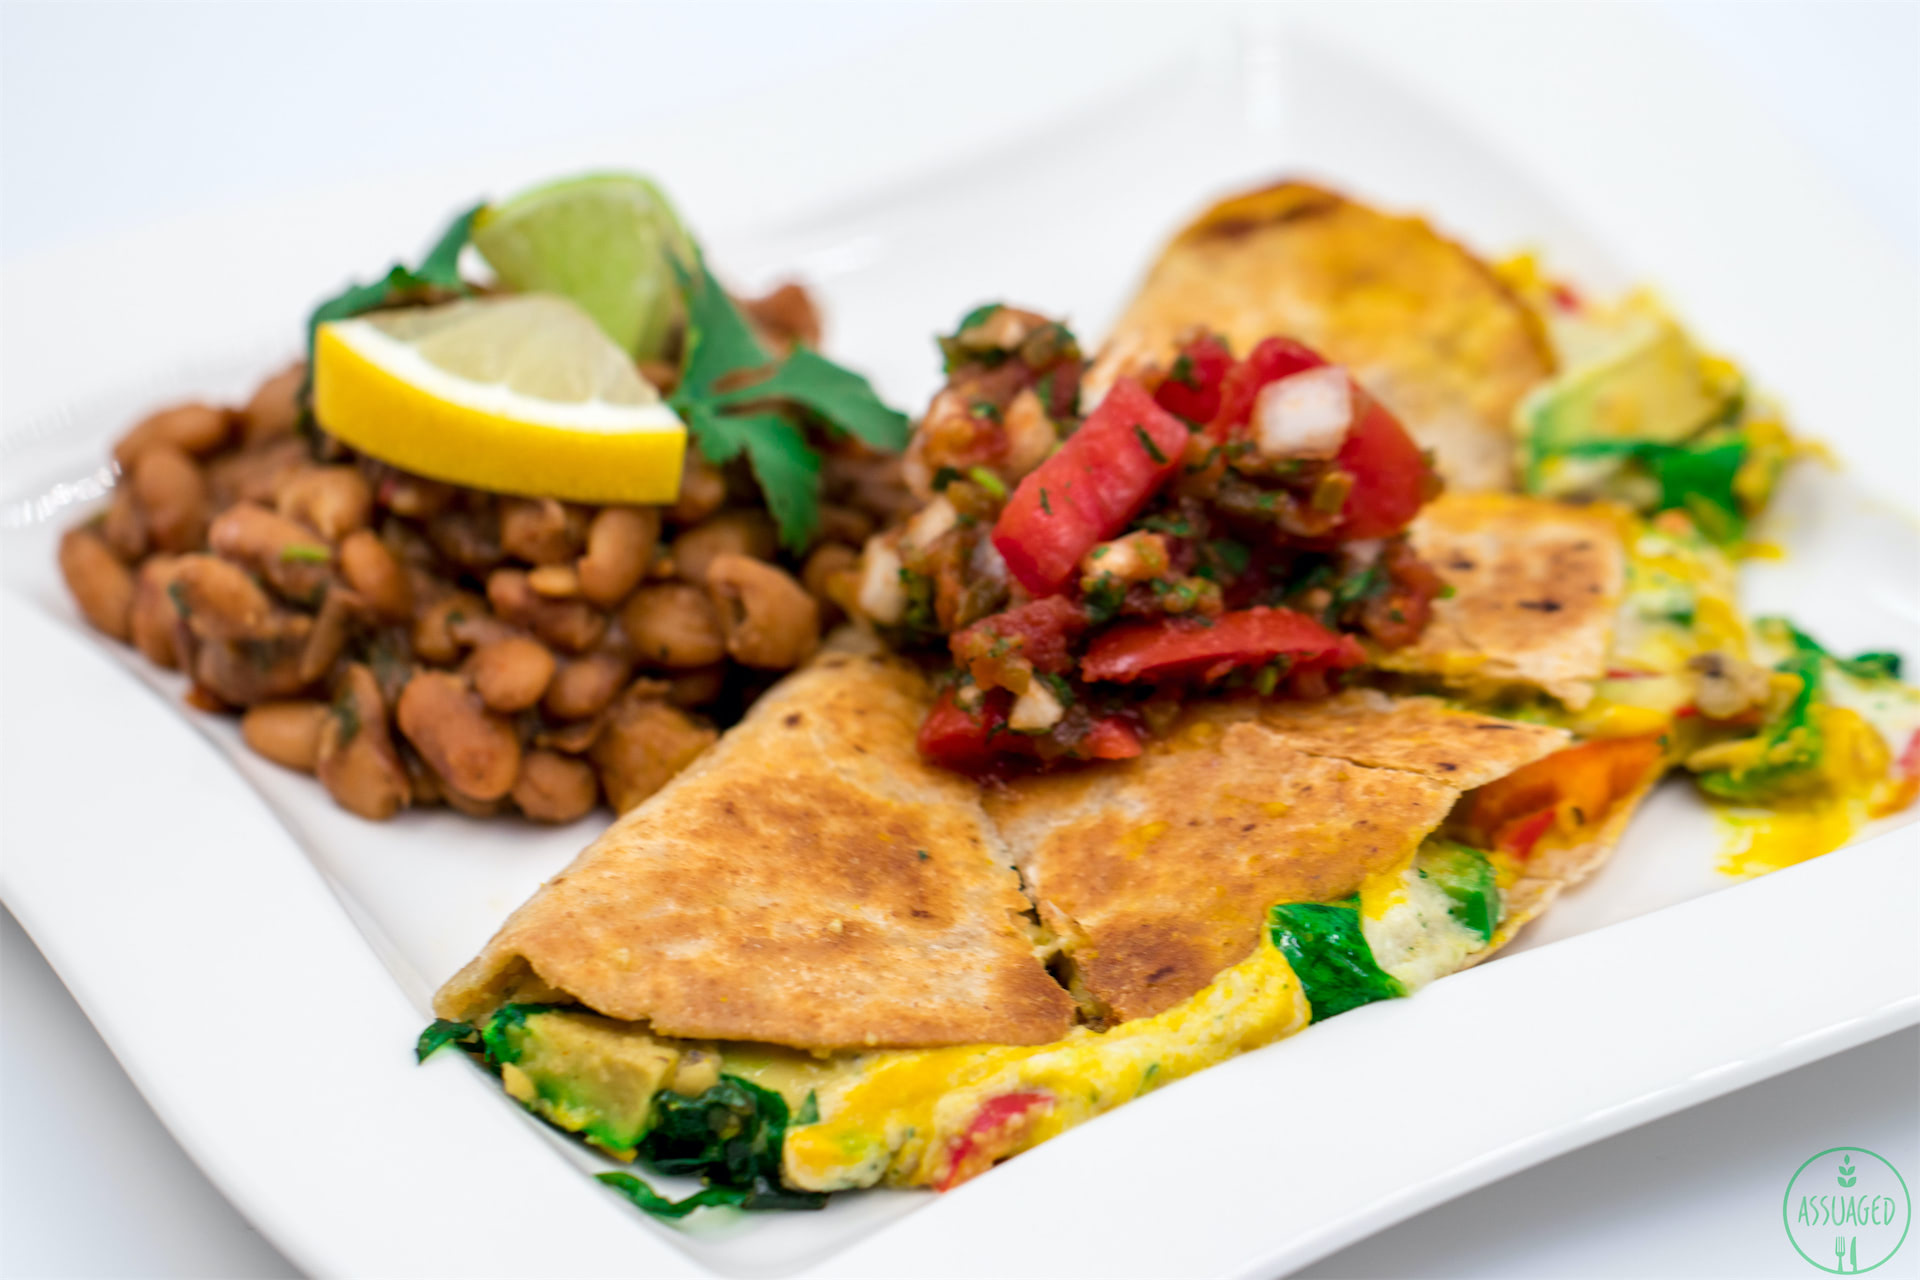 BONUS: Creamy Vegan Jalapeño Cheddar Cheese Recipe